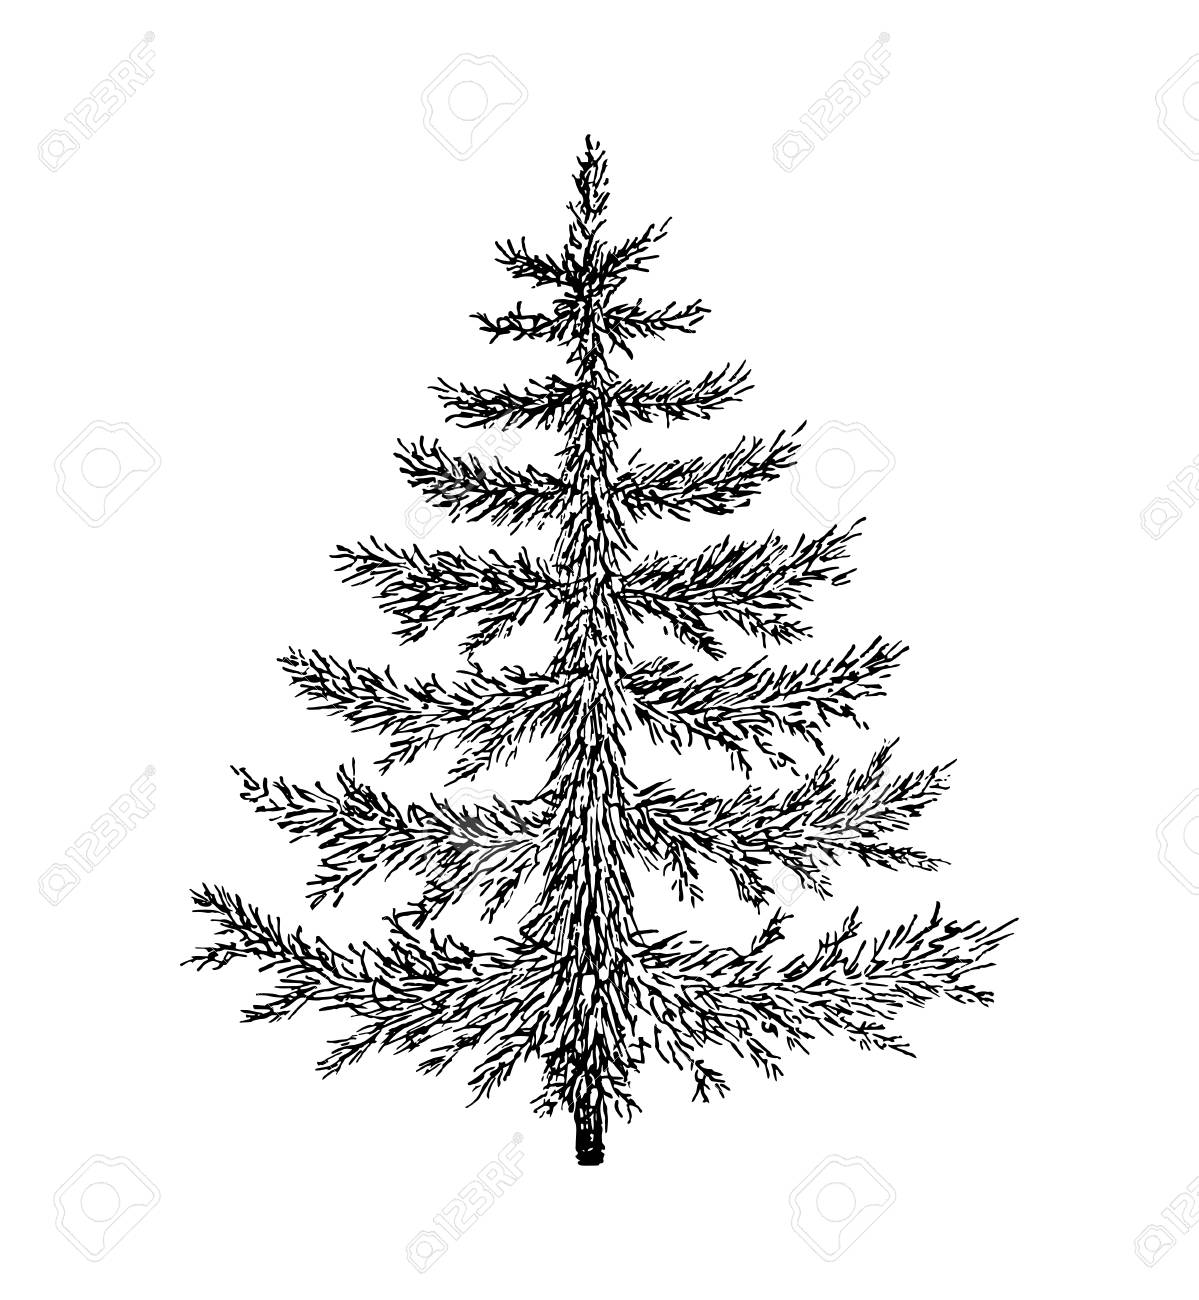 Evergreen Tree Drawing At Getdrawings